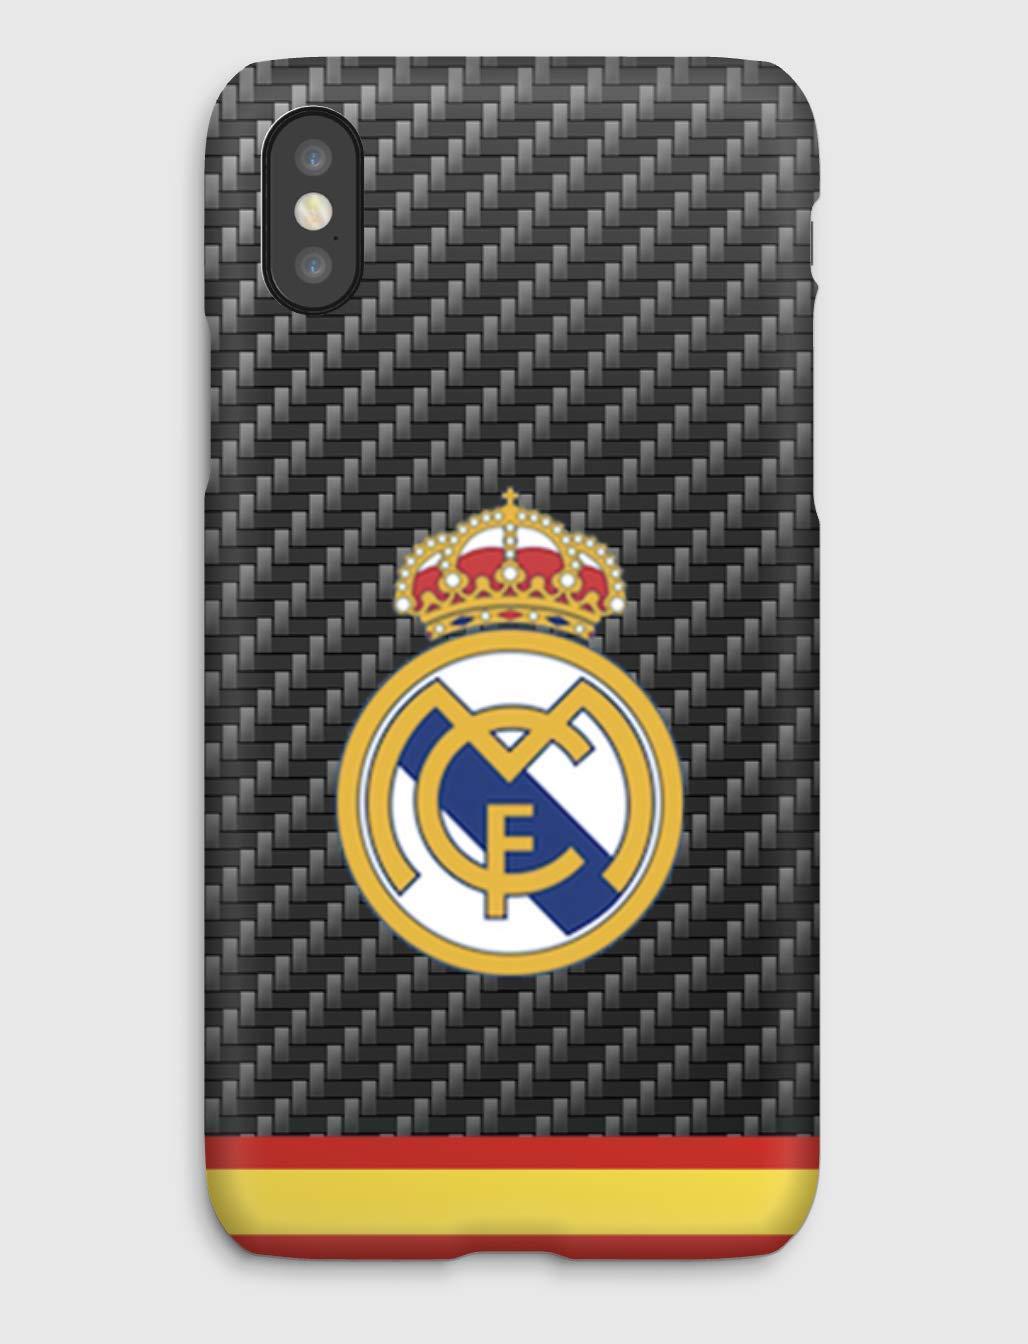 Real Madrid Club de Fútbol Funda para el iPhone XS, XS Max, XR, X, 8, 8+, 7, 7+, 6S, 6, 6S+, 6+, 5C, 5, 5S, 5SE, 4S, 4,